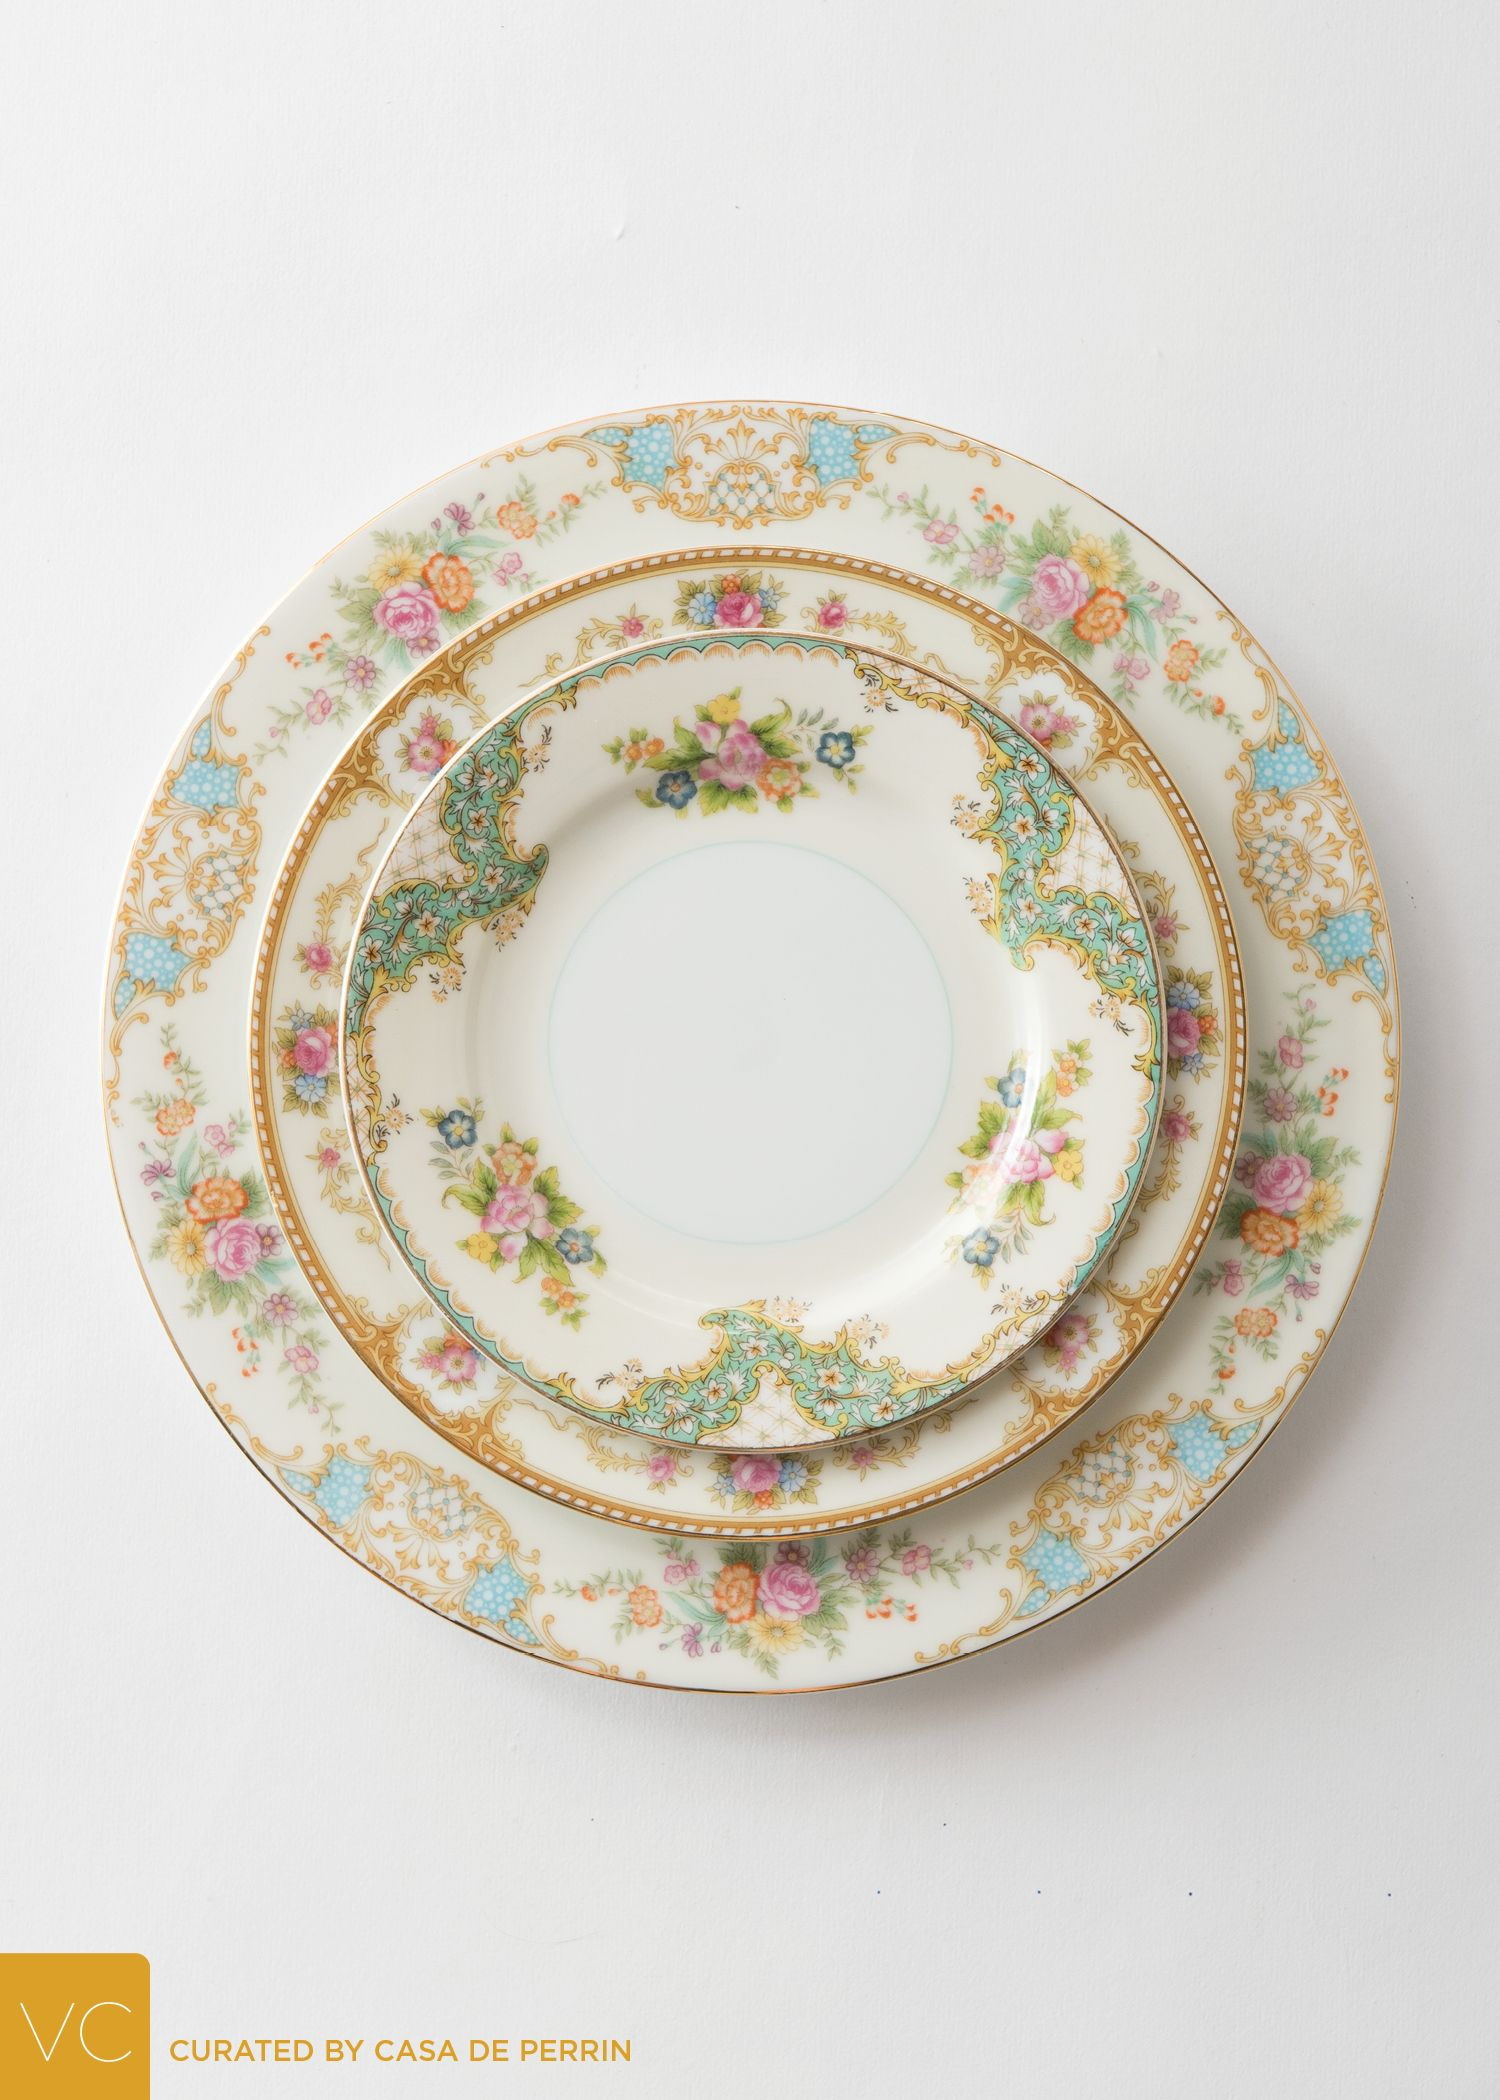 Le Melange Vintage China Vintage China Patterns Vintage Dinnerware